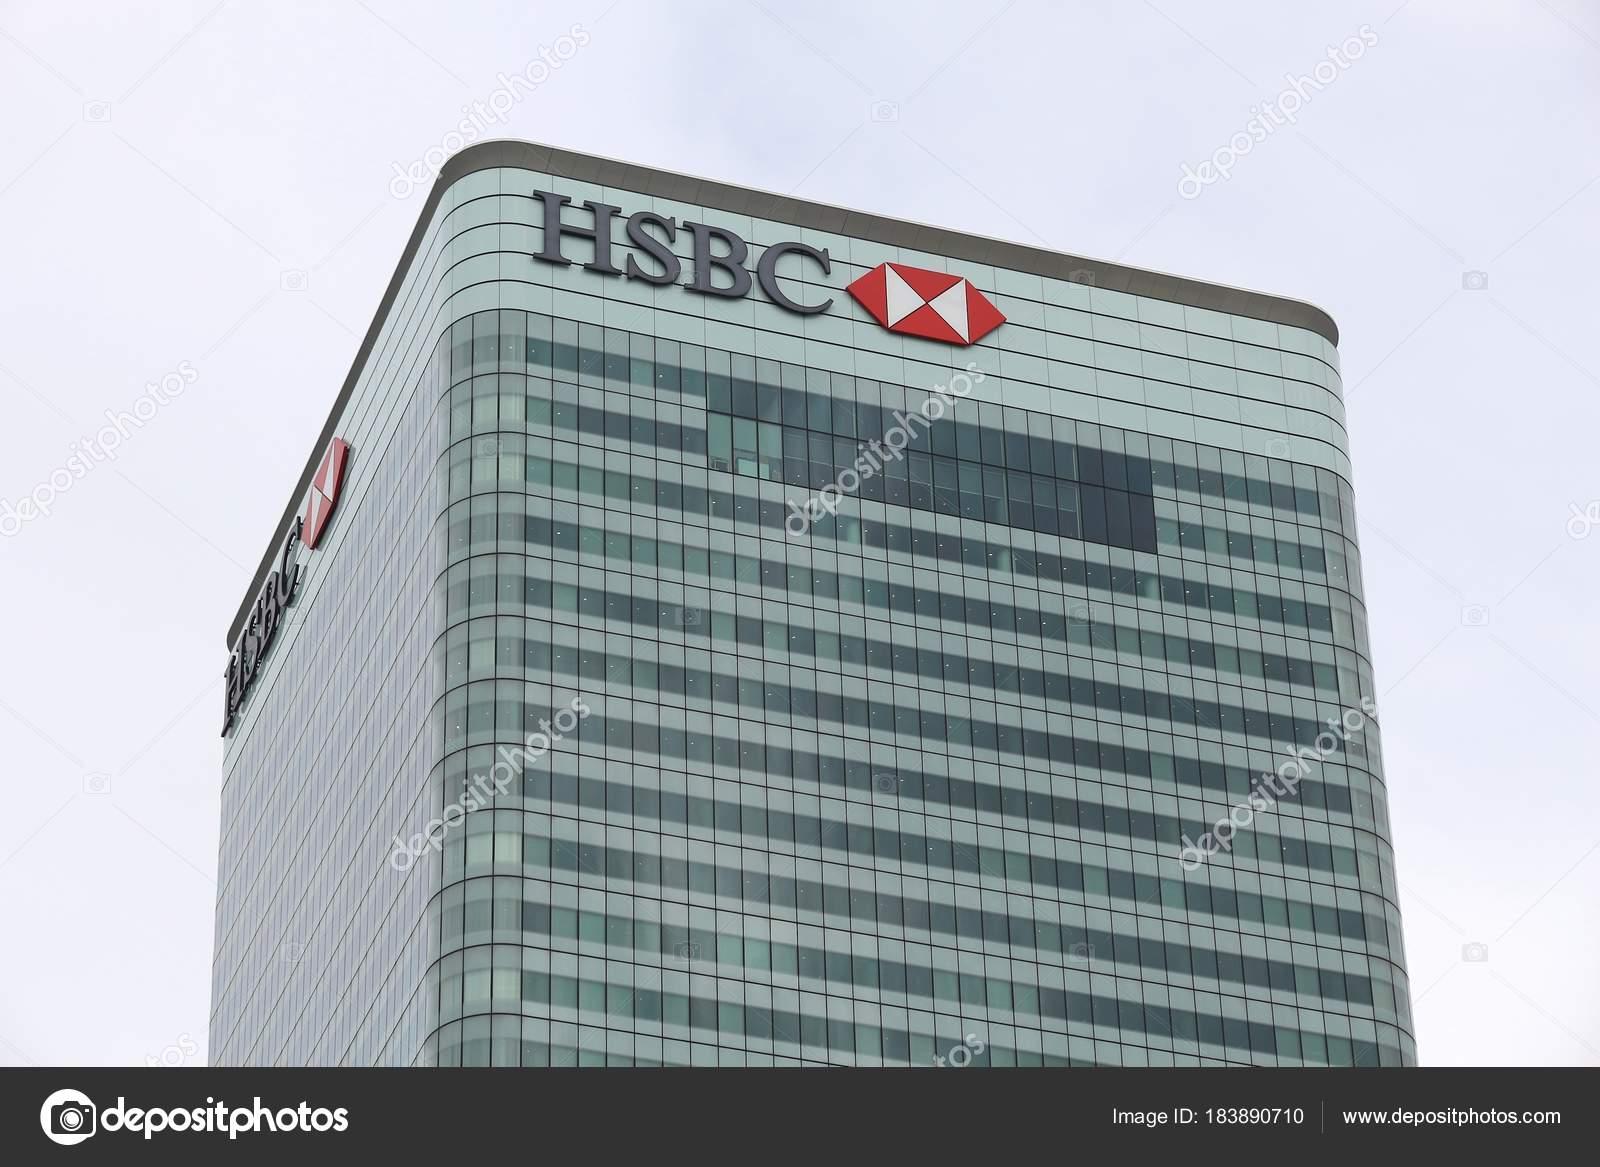 HSBC - United Kingdom – Stock Editorial Photo © tupungato #183890710